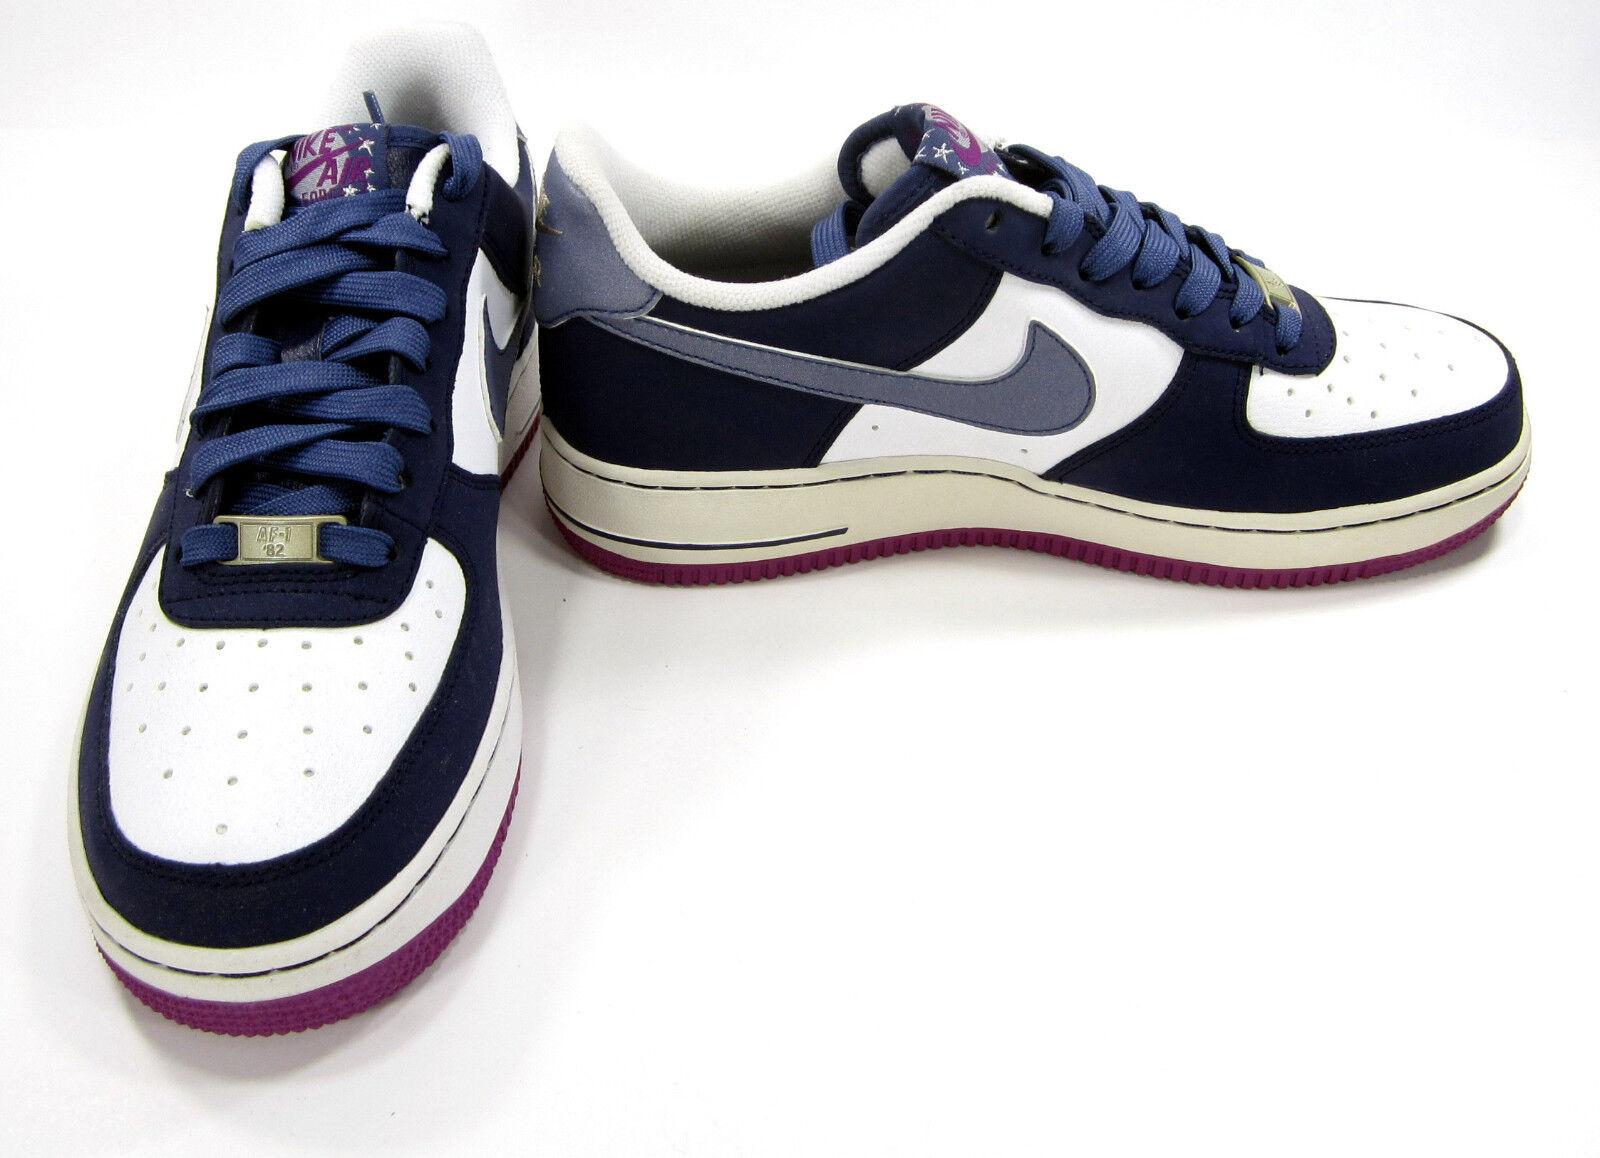 Zapatillas Nike Air Force 1 Low blanco / azul / Casual morado zapatillas comodas Wild Casual / Shoes 0dd79d